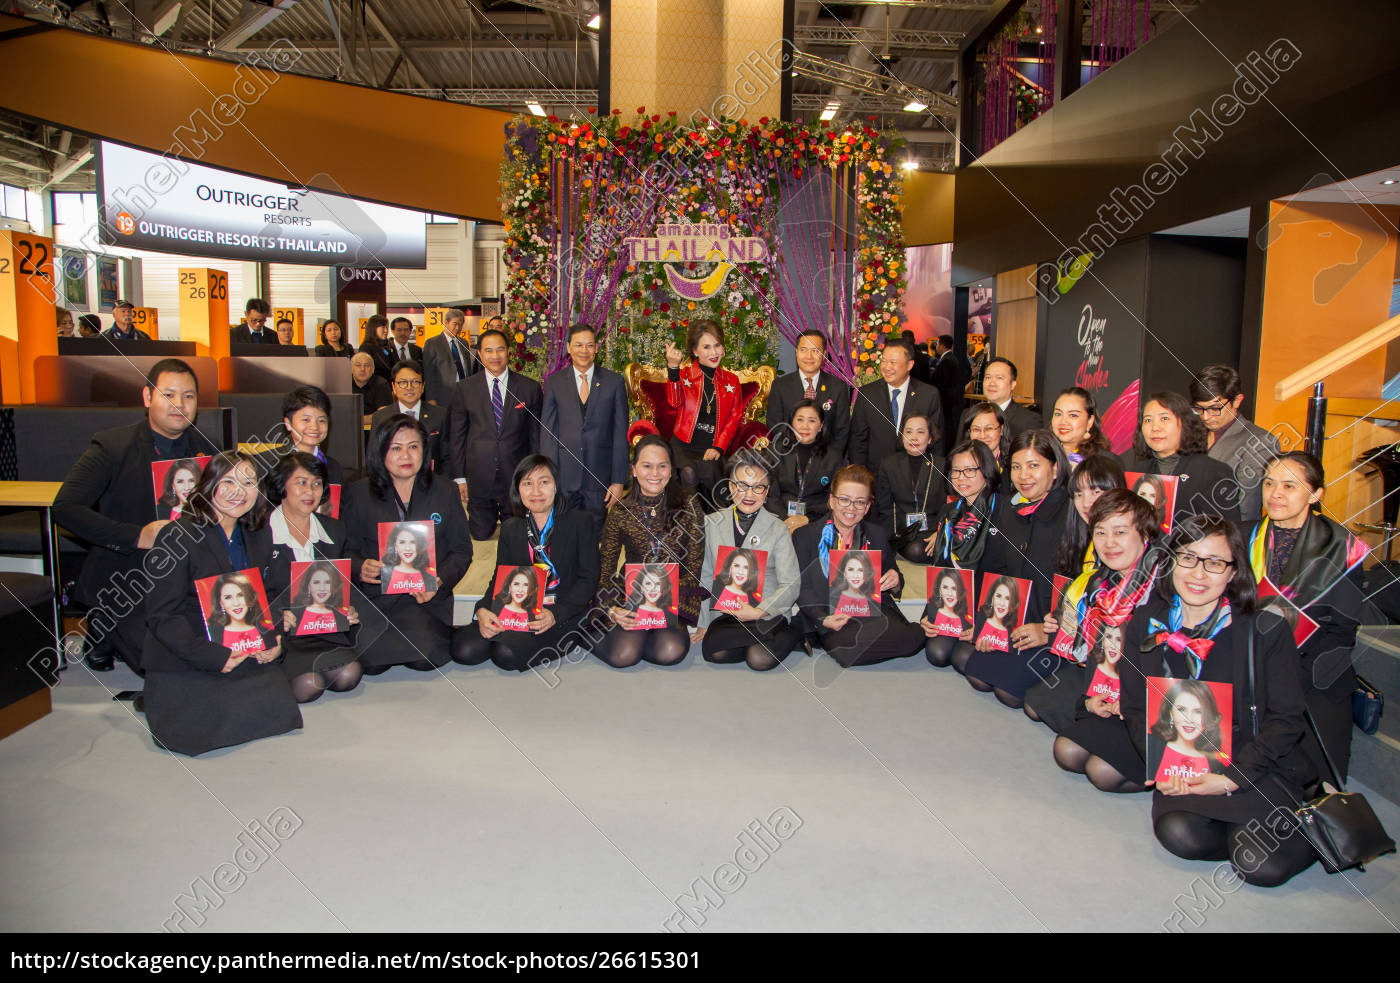 princess, ubol, ratana, of, thailand, attends - 26615301